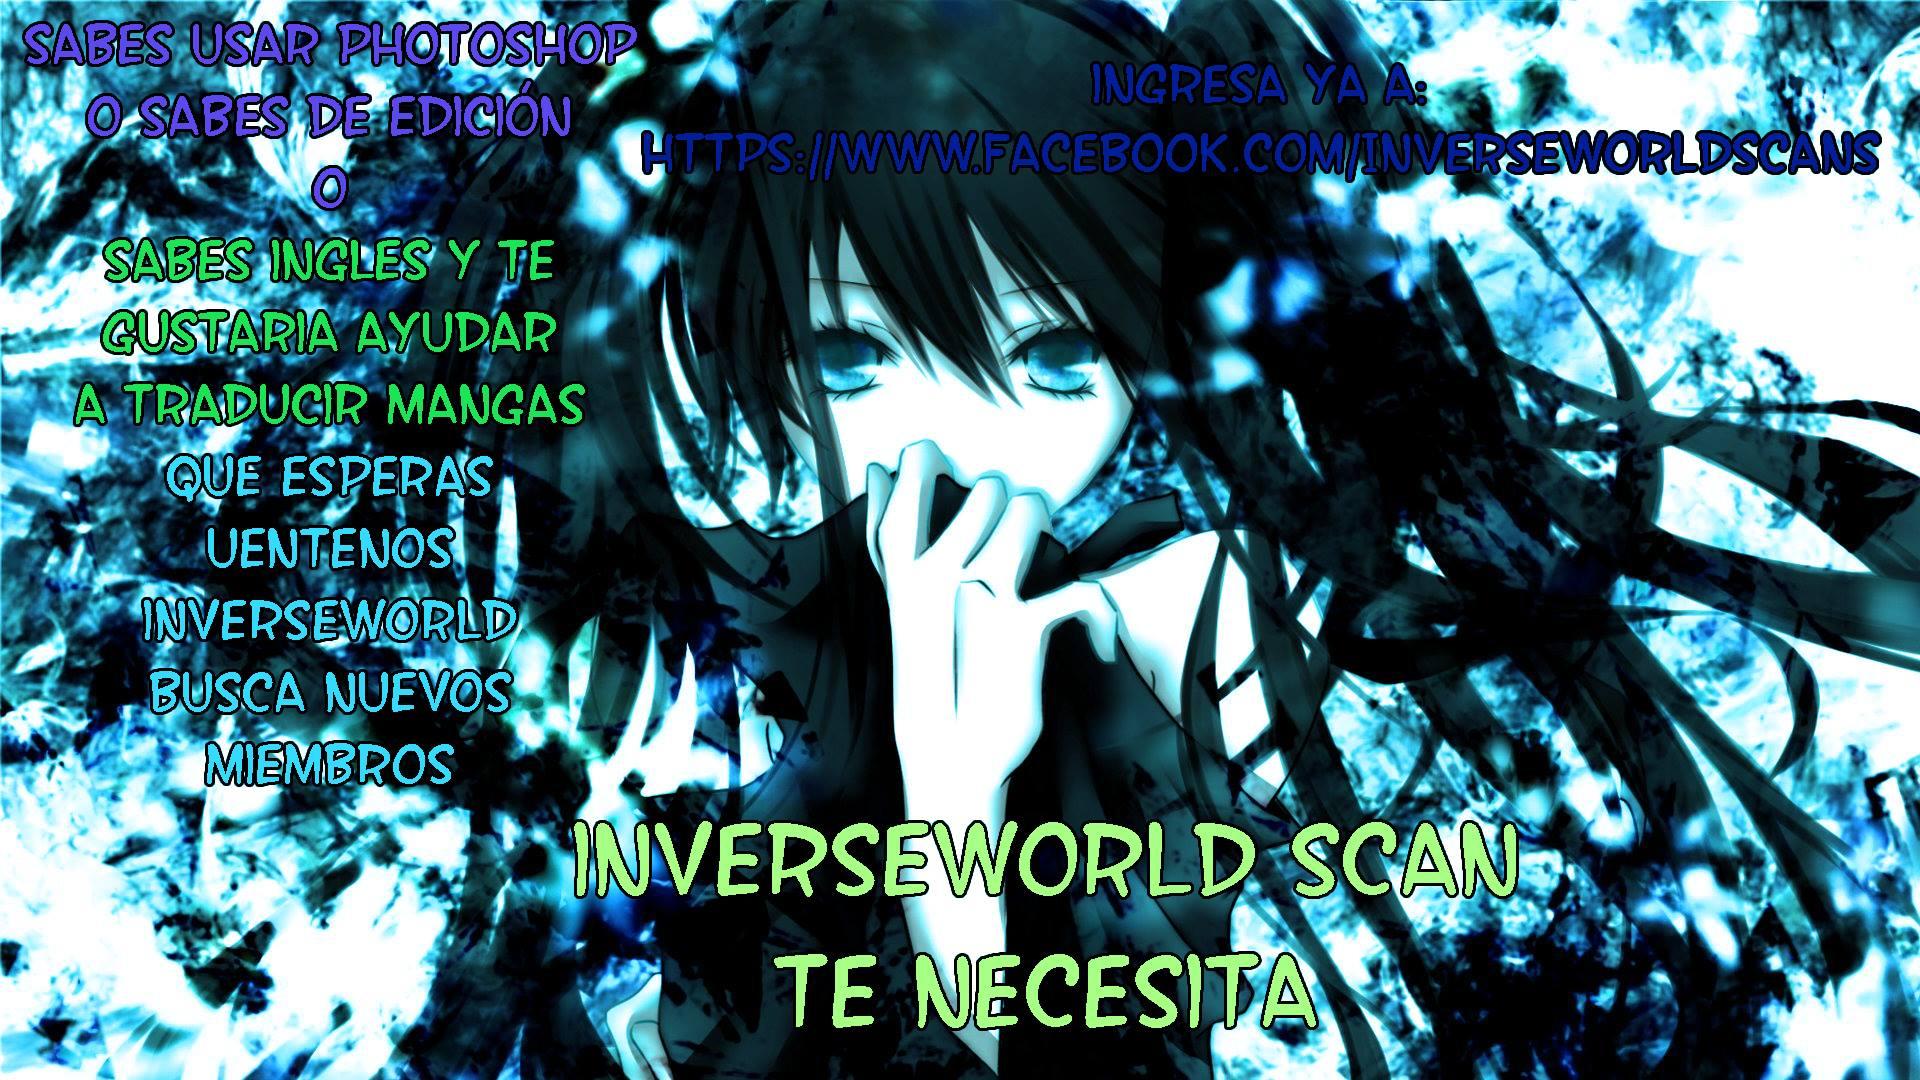 http://c5.ninemanga.com/es_manga/18/16210/391366/3d9ca21c6f428bafd84442926c4f7e9c.jpg Page 1